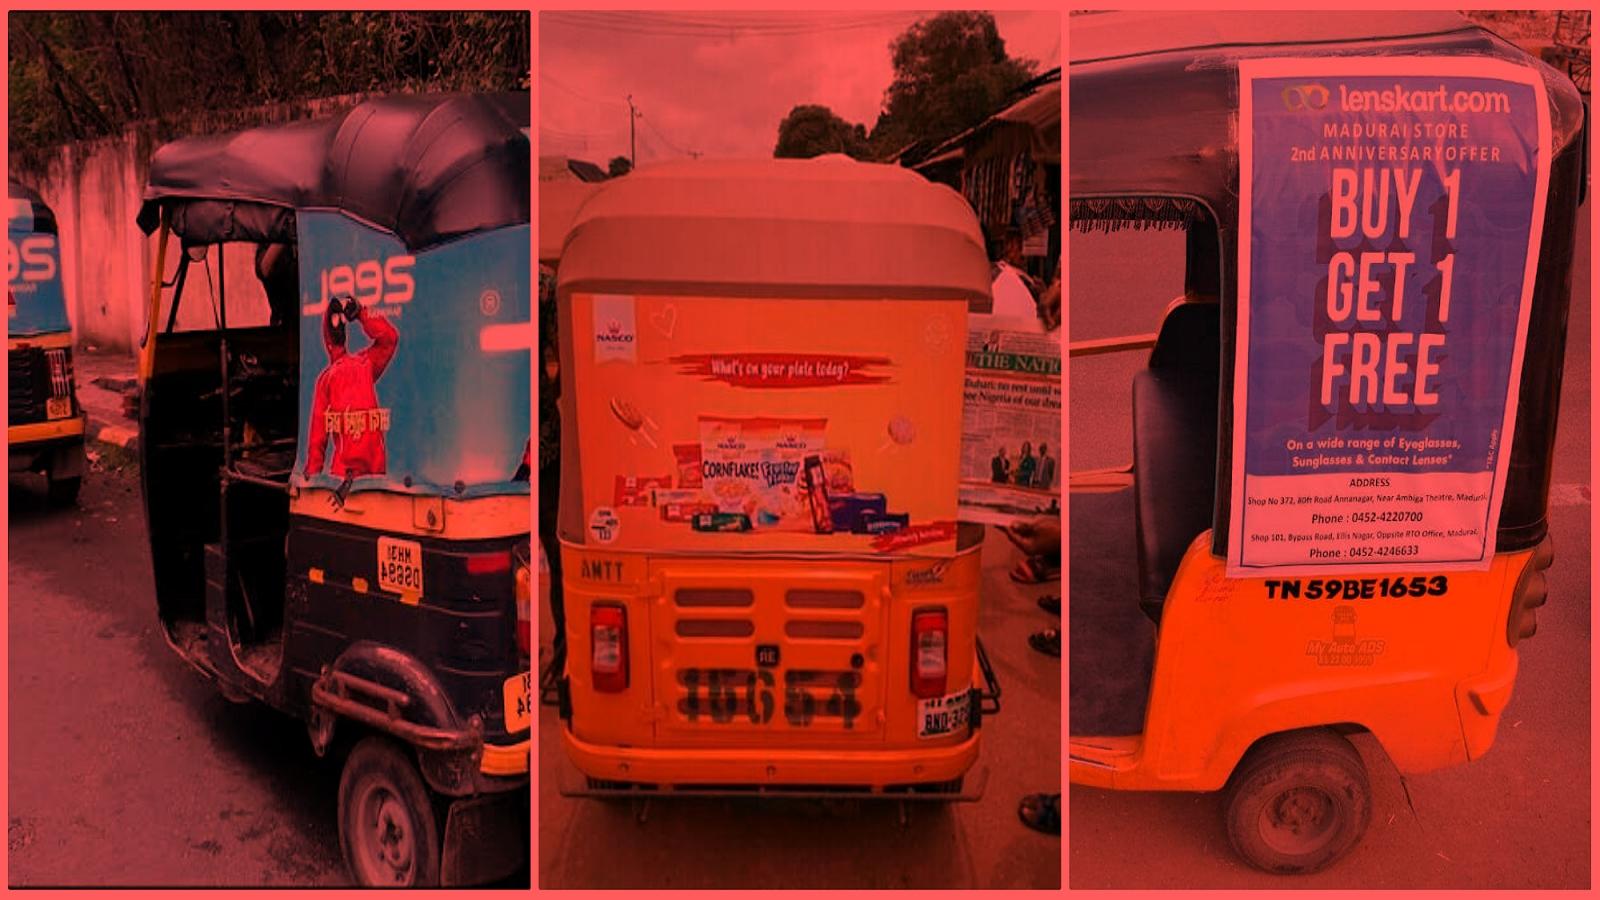 Keke Branding, Auto Rickshaw Advertising, Auto Rickshaw Advertising Agency, Auto Rickshaw Advertising In Nigeria, Auto Rickshaw Branding, Auto Rickshaw Advertising Agency In Lagos,